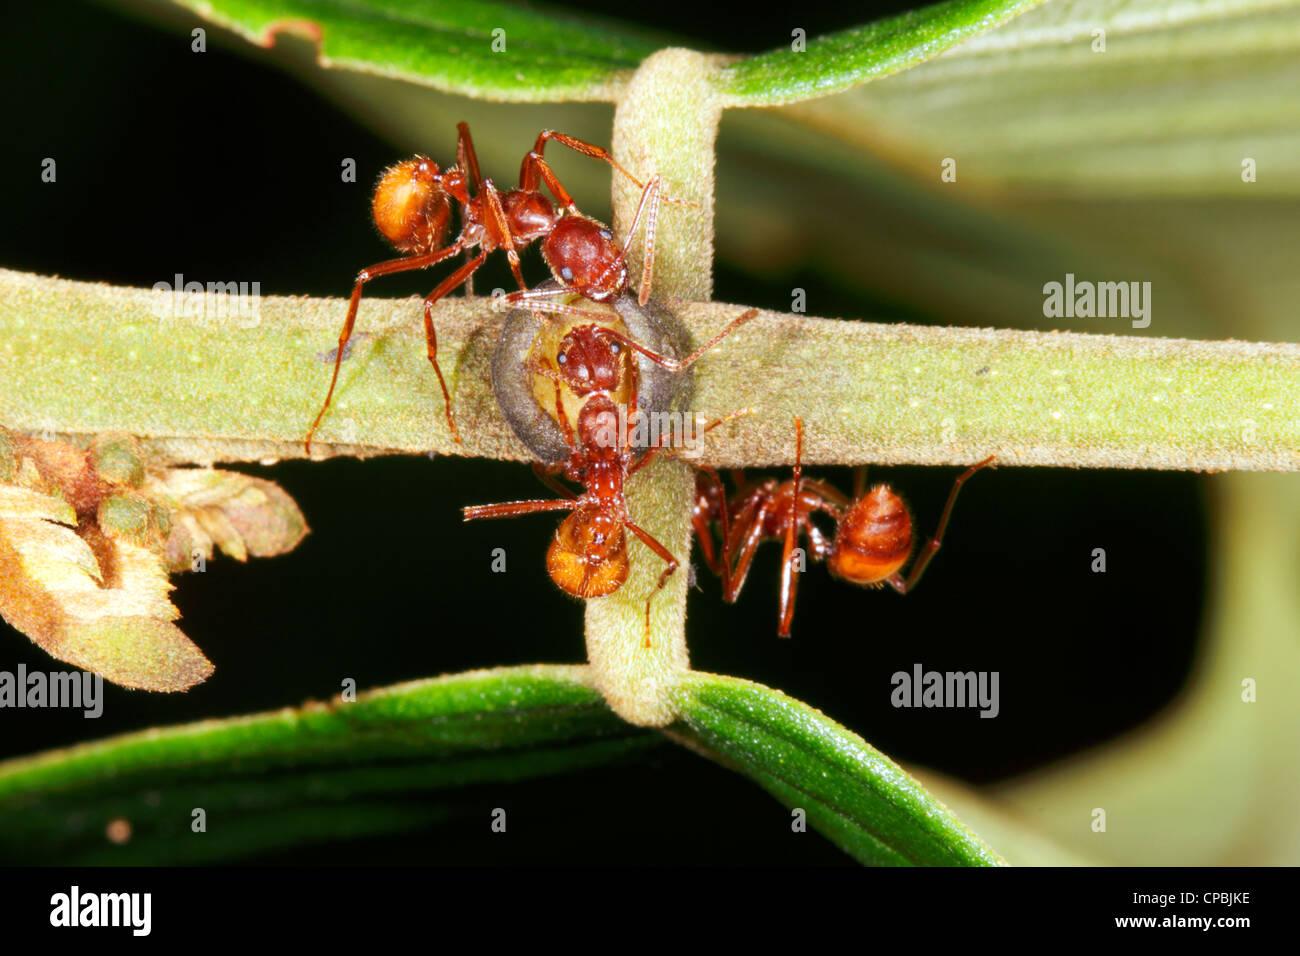 Petiole Ant